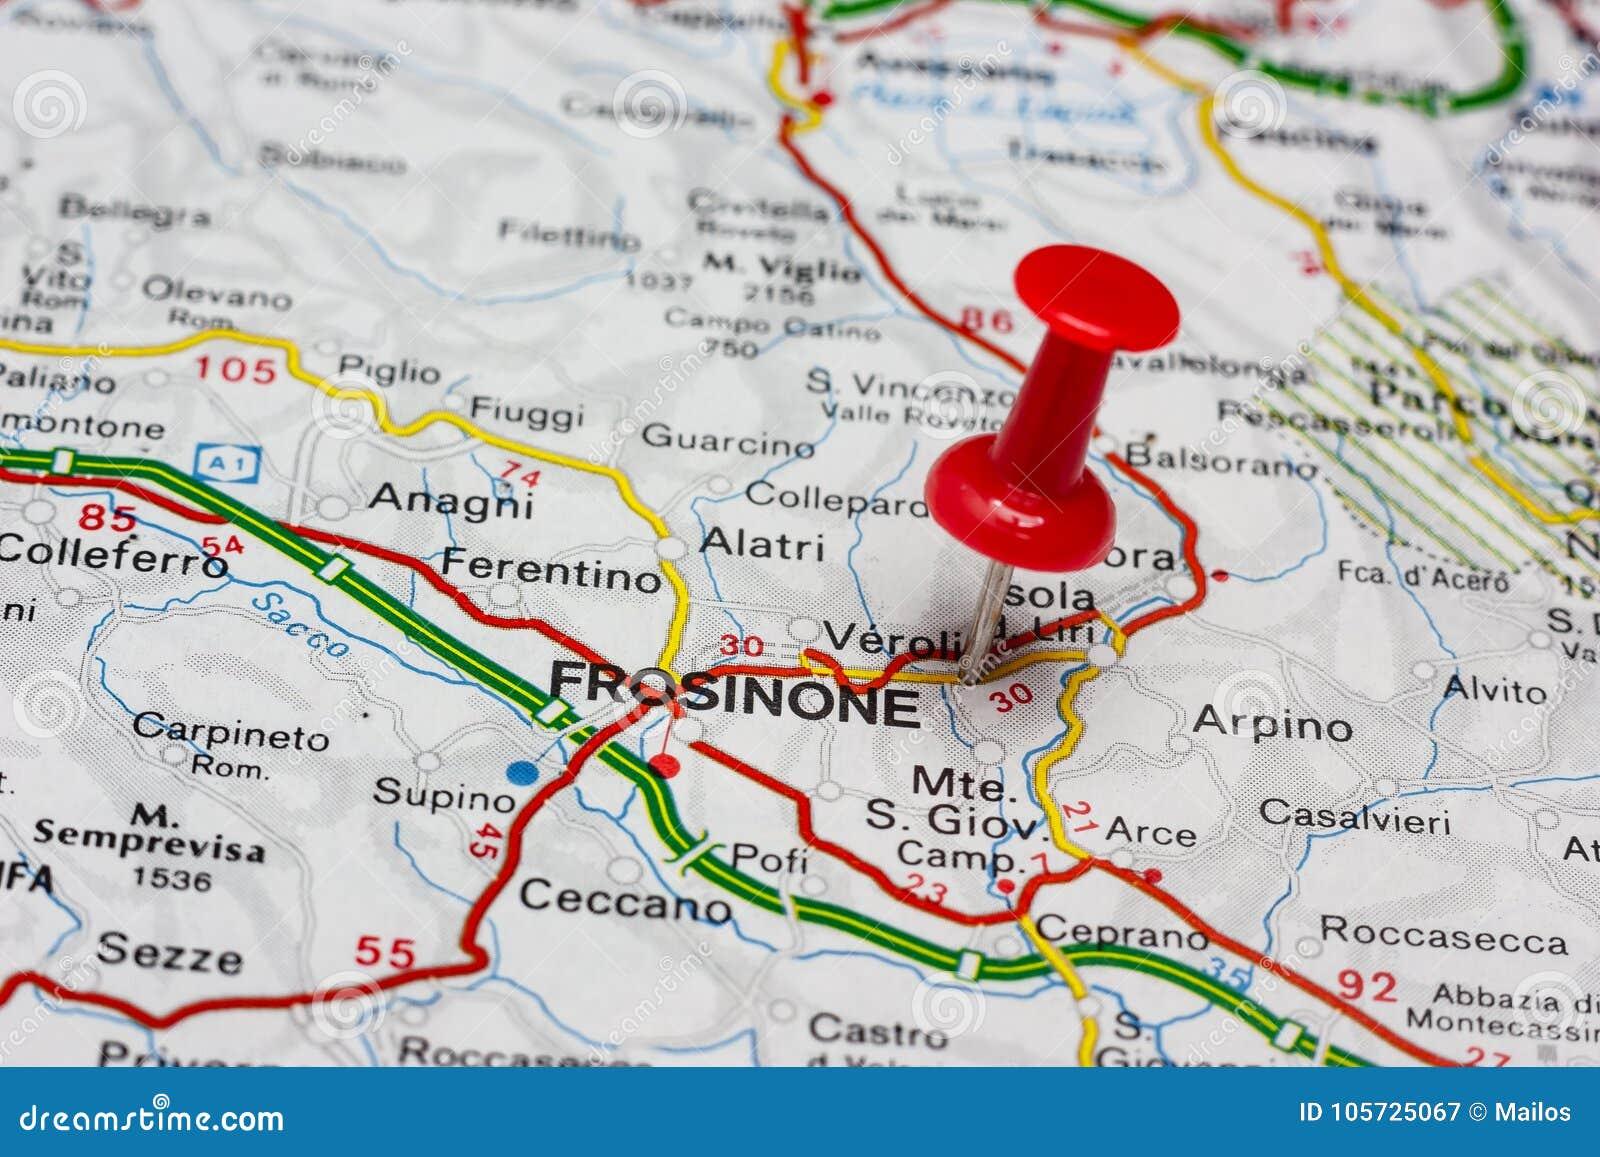 Frosinone Italy Map.Frosinone Pinned On A Map Of Italy Stock Image Image Of Italy